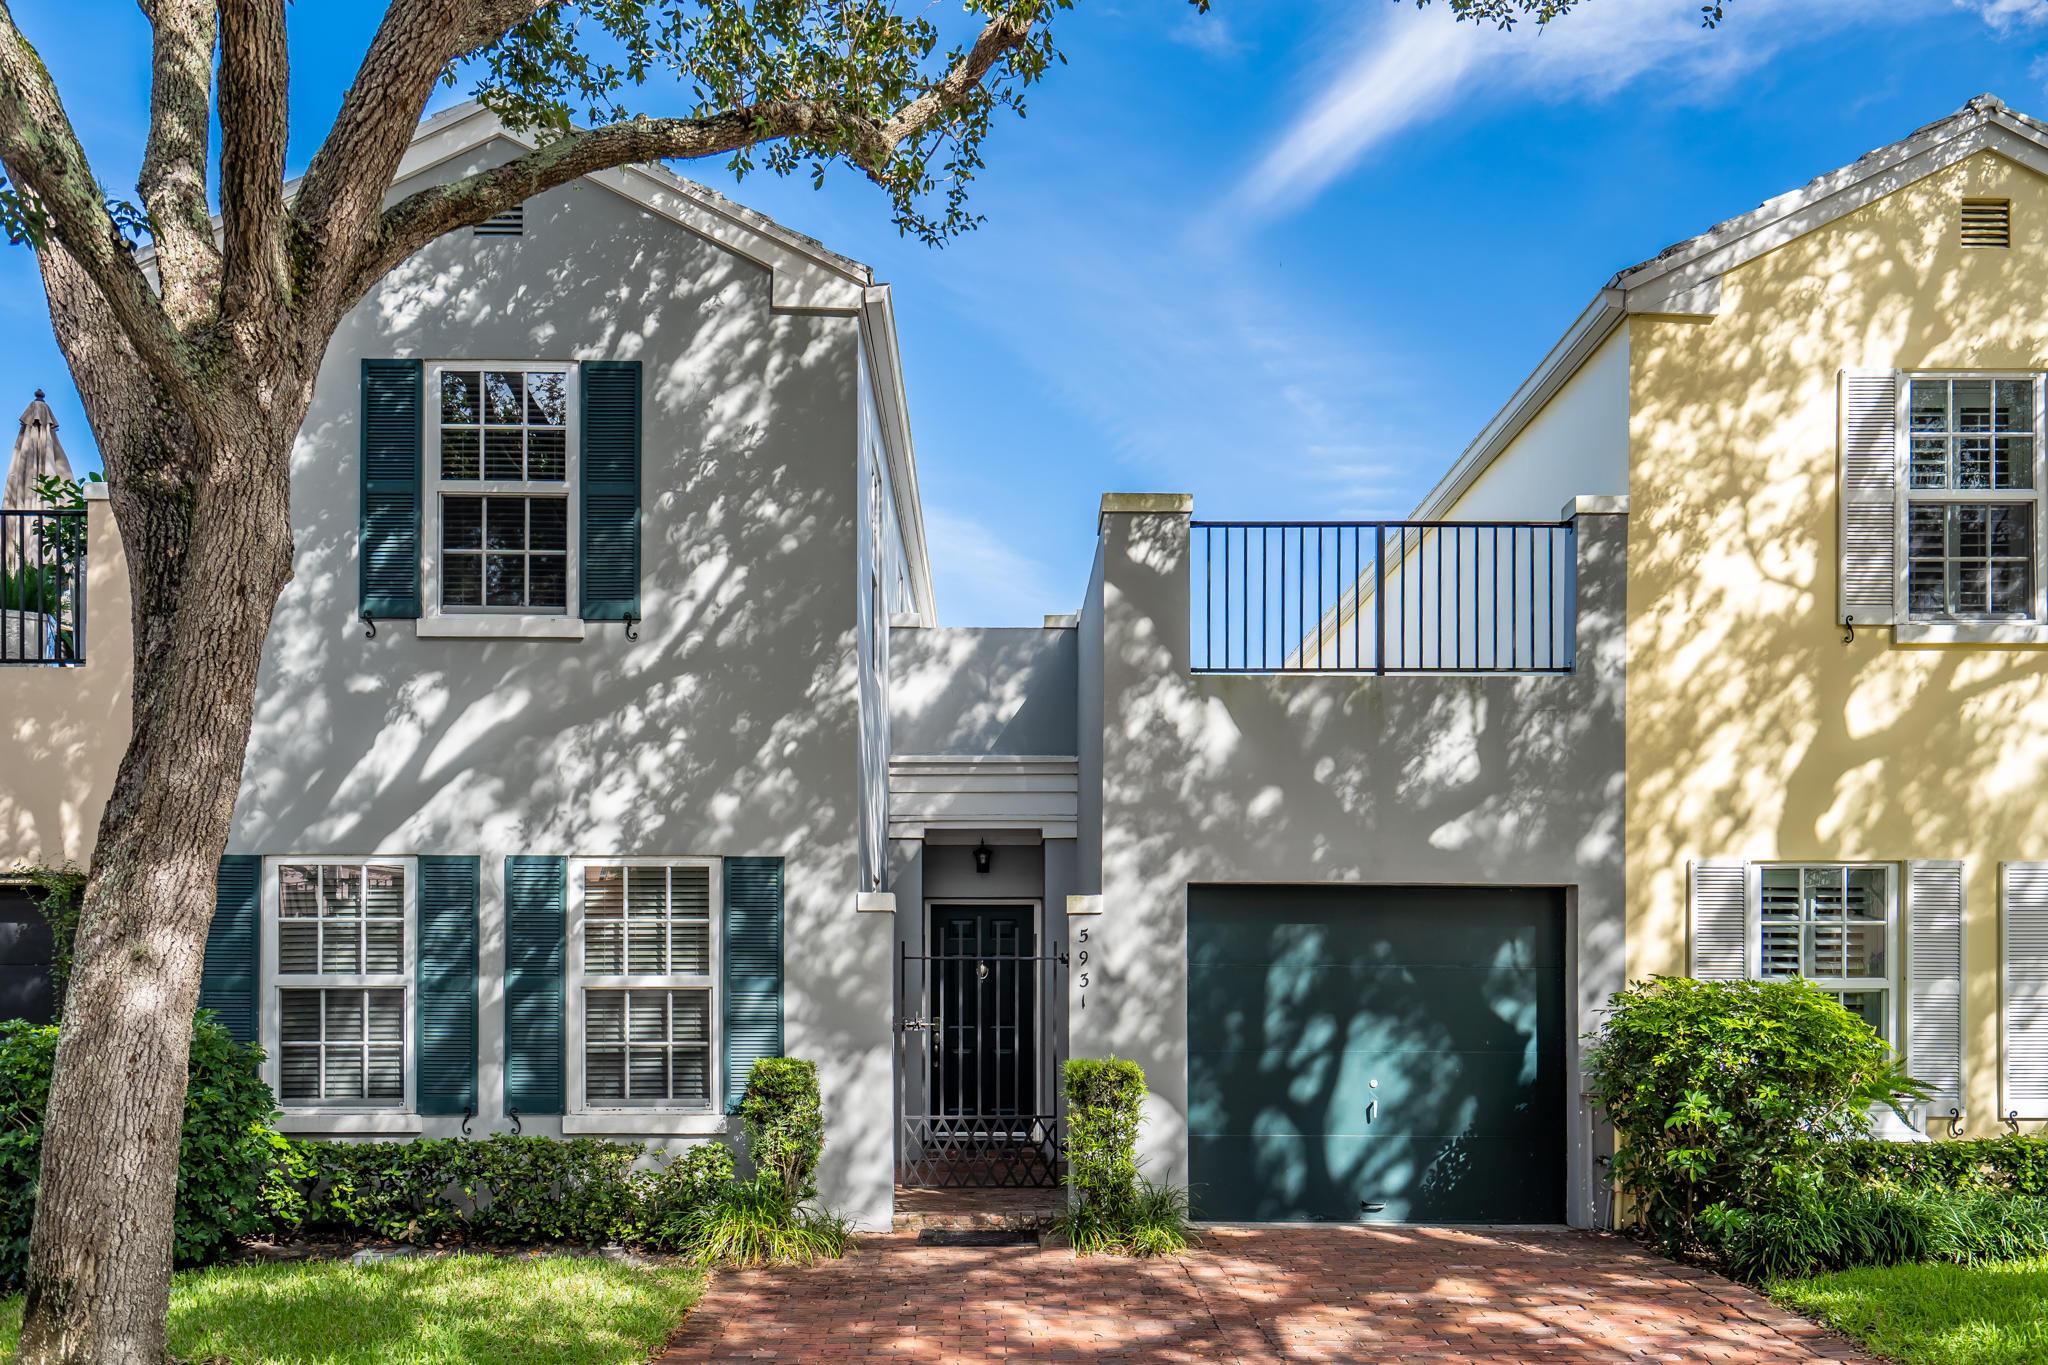 5931 Catesby Street, Boca Raton, Florida 33433, 2 Bedrooms Bedrooms, ,2.1 BathroomsBathrooms,A,Townhouse,Catesby,RX-10577932